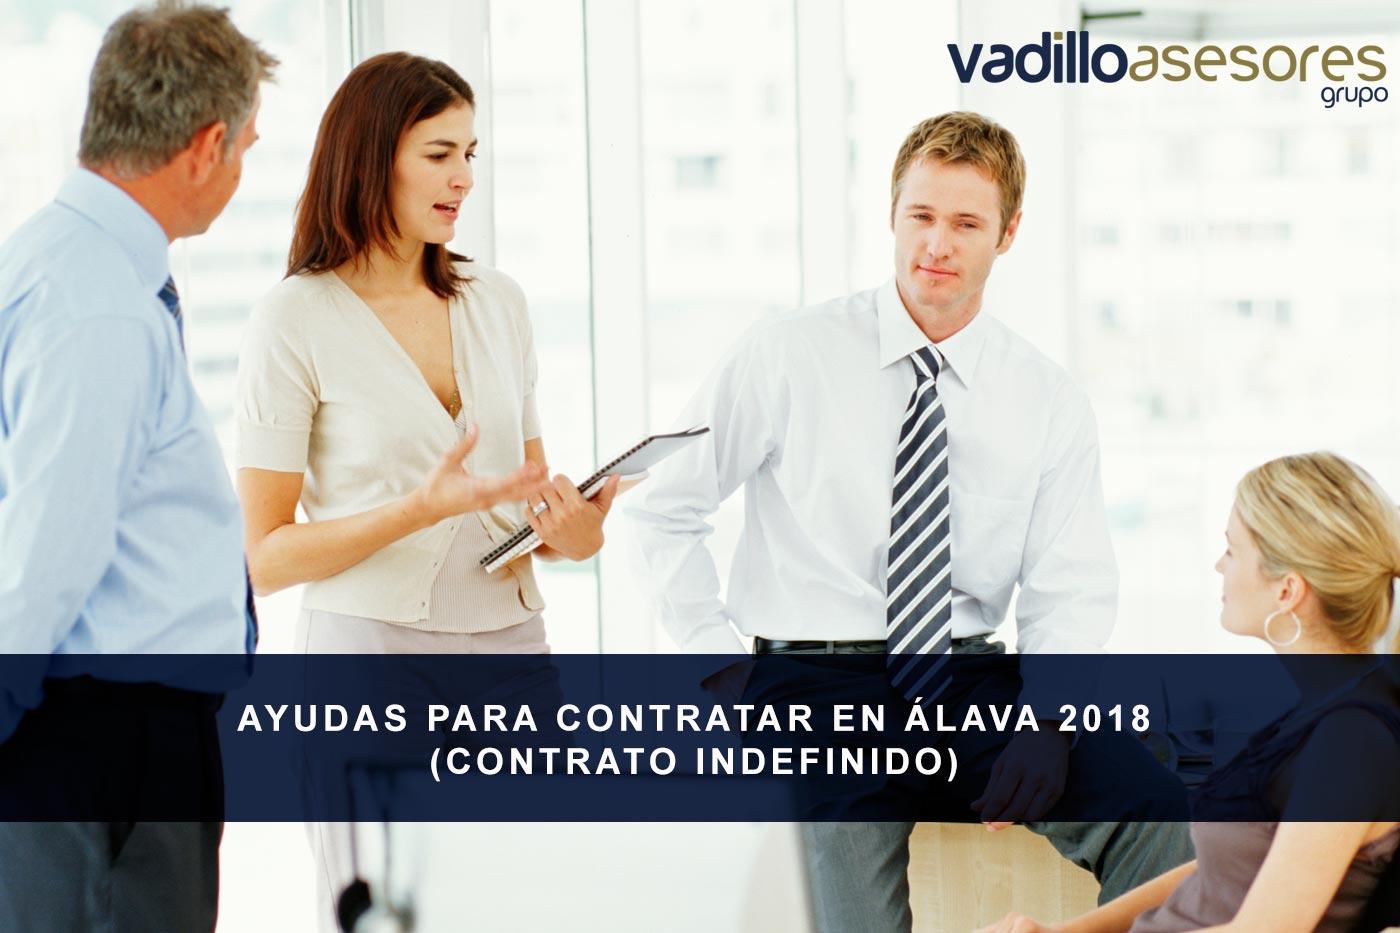 Ayudas para contratar en Álava 2018 (contrato indefinido)